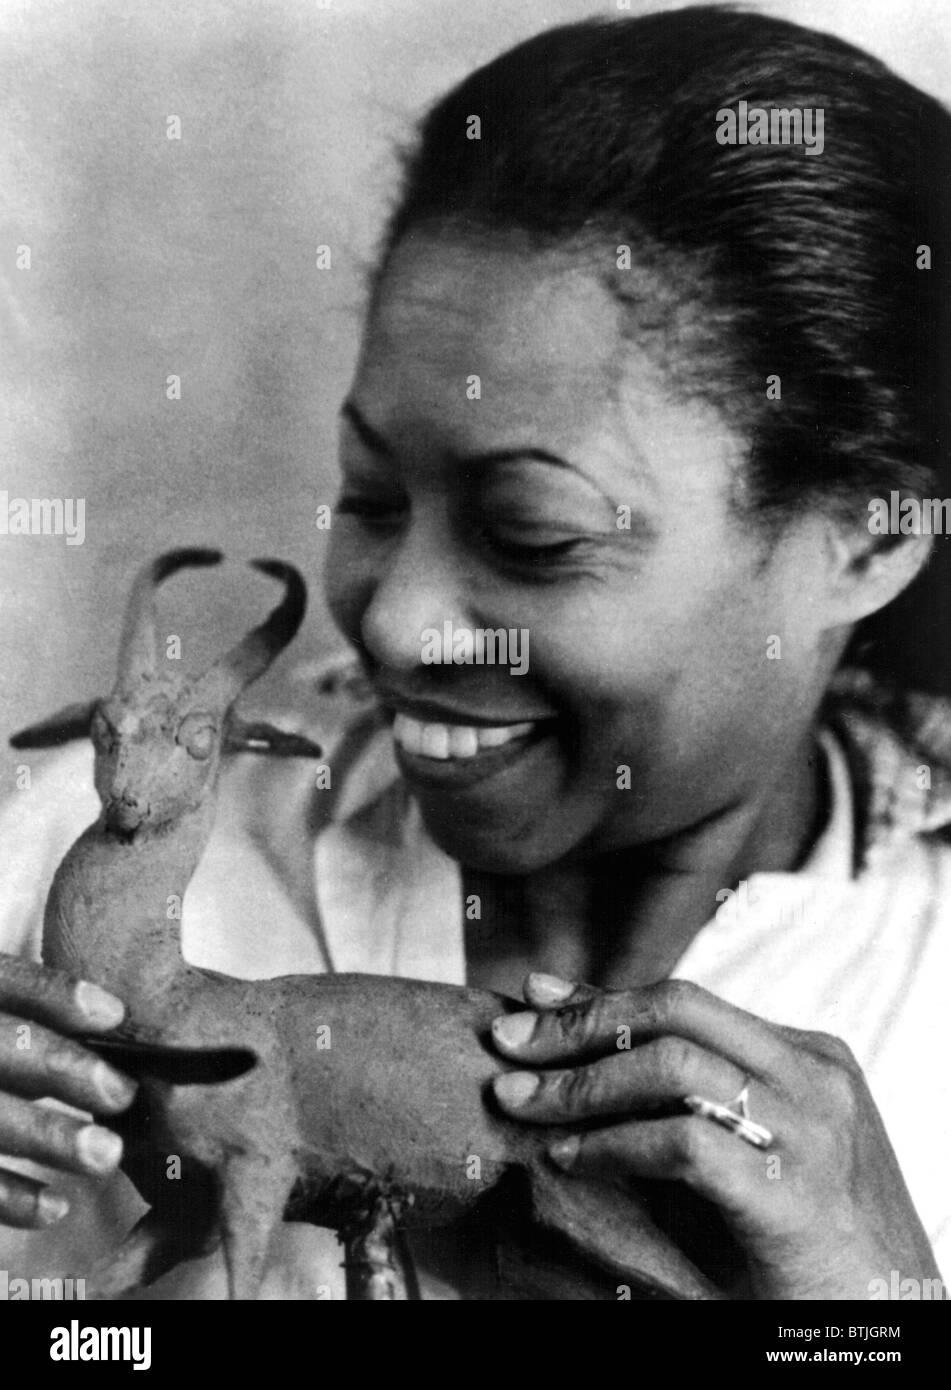 AUGUSTA SAVAGE (1892-1962) Stock Photo